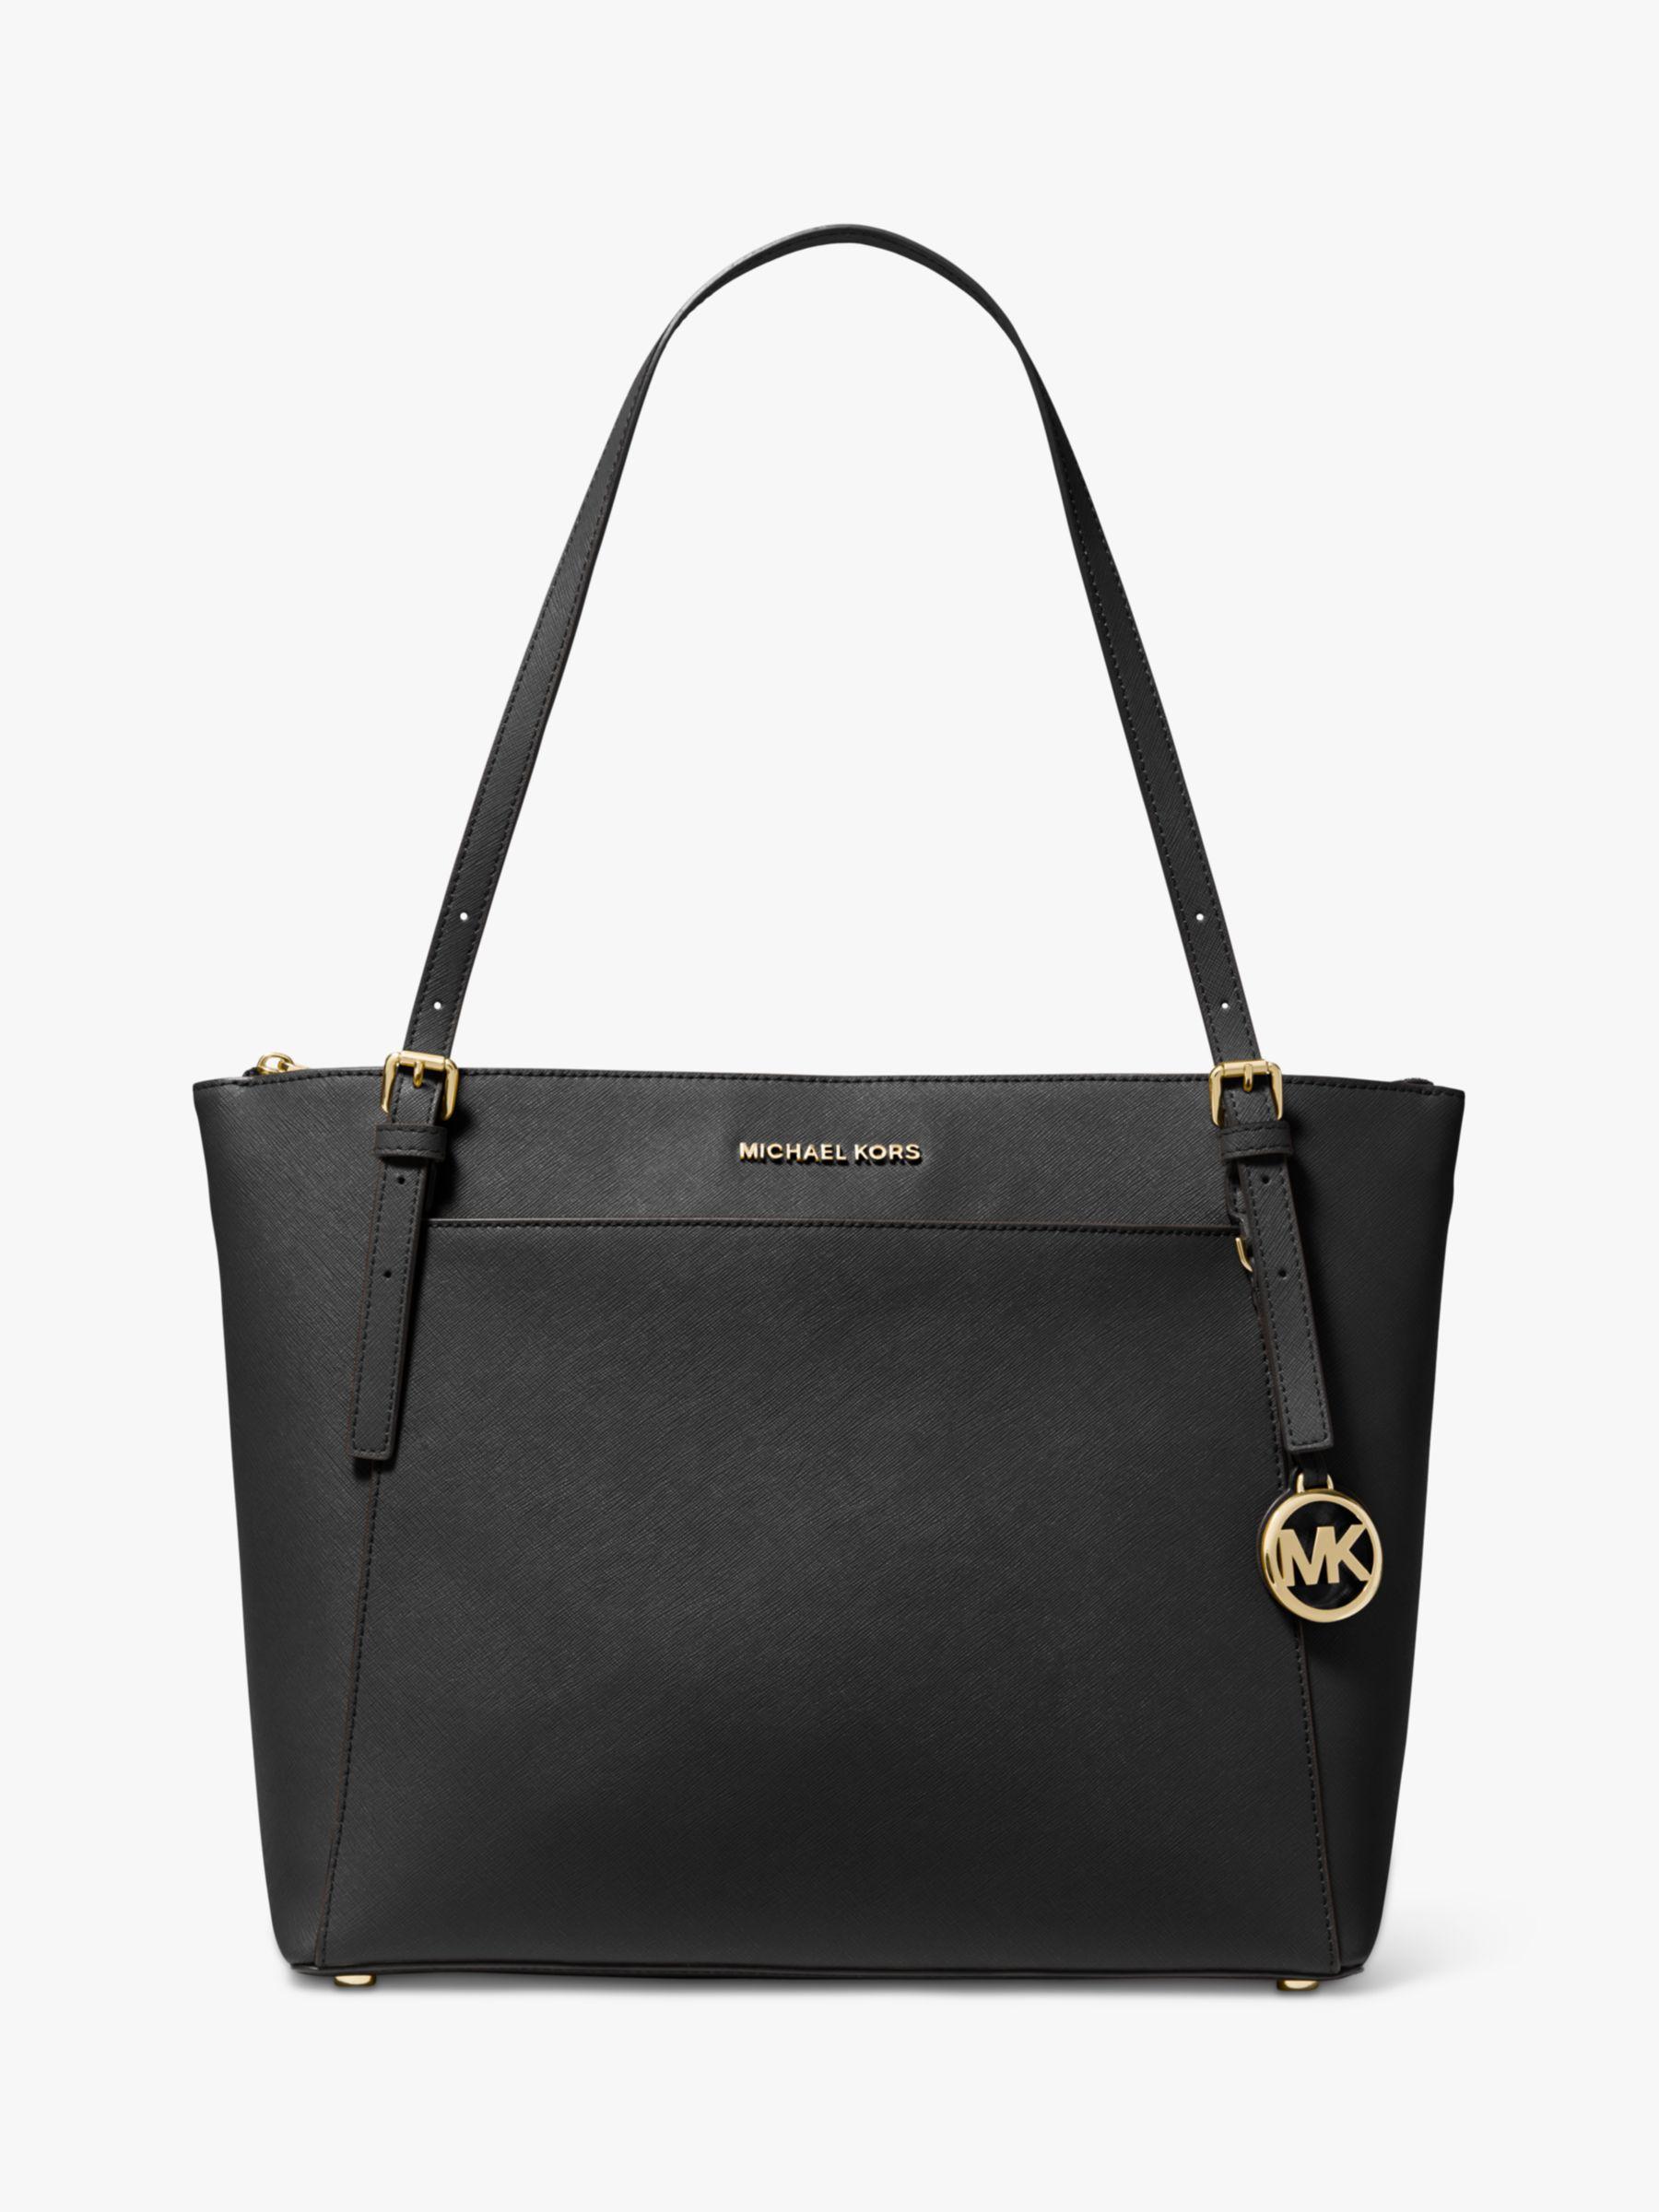 michael kors black and white purse